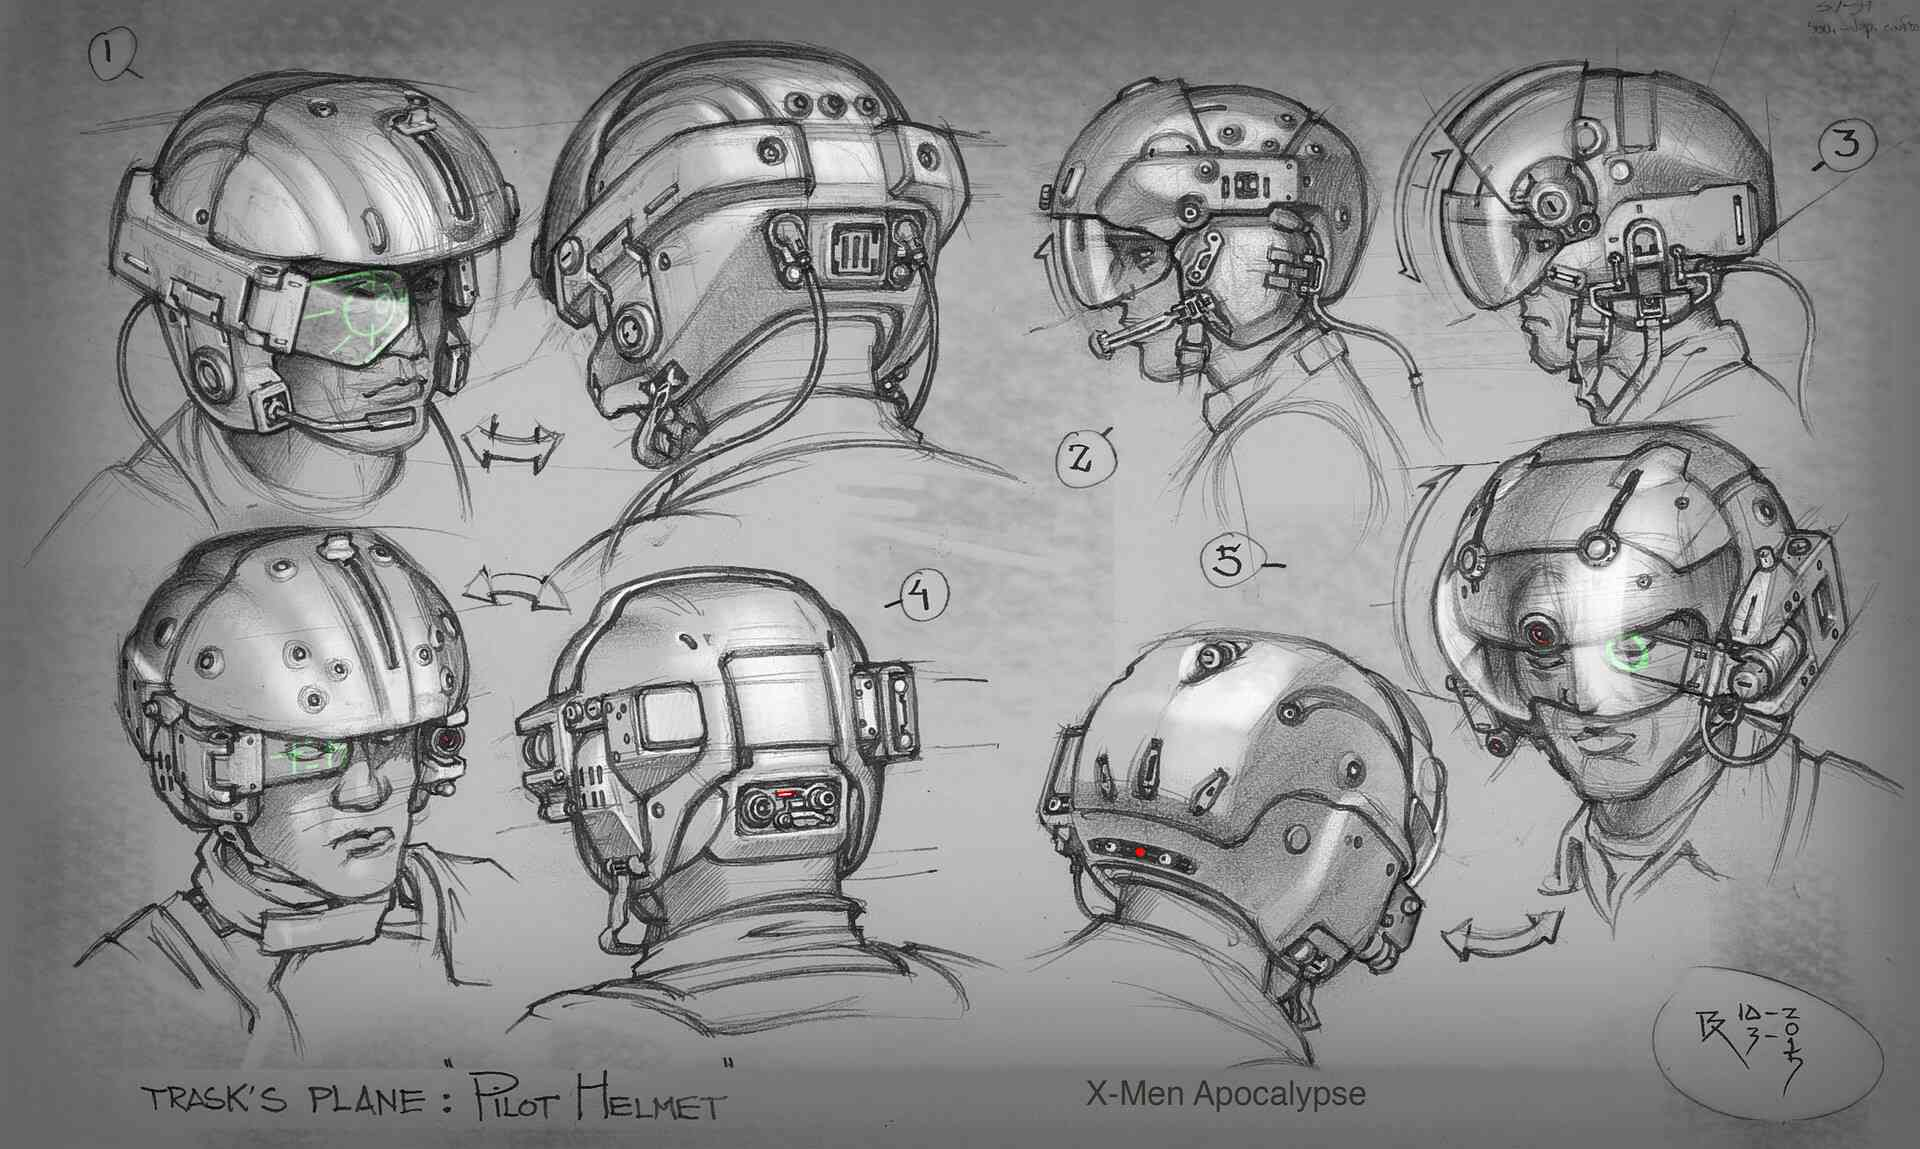 Pilot's helmet concept art 2